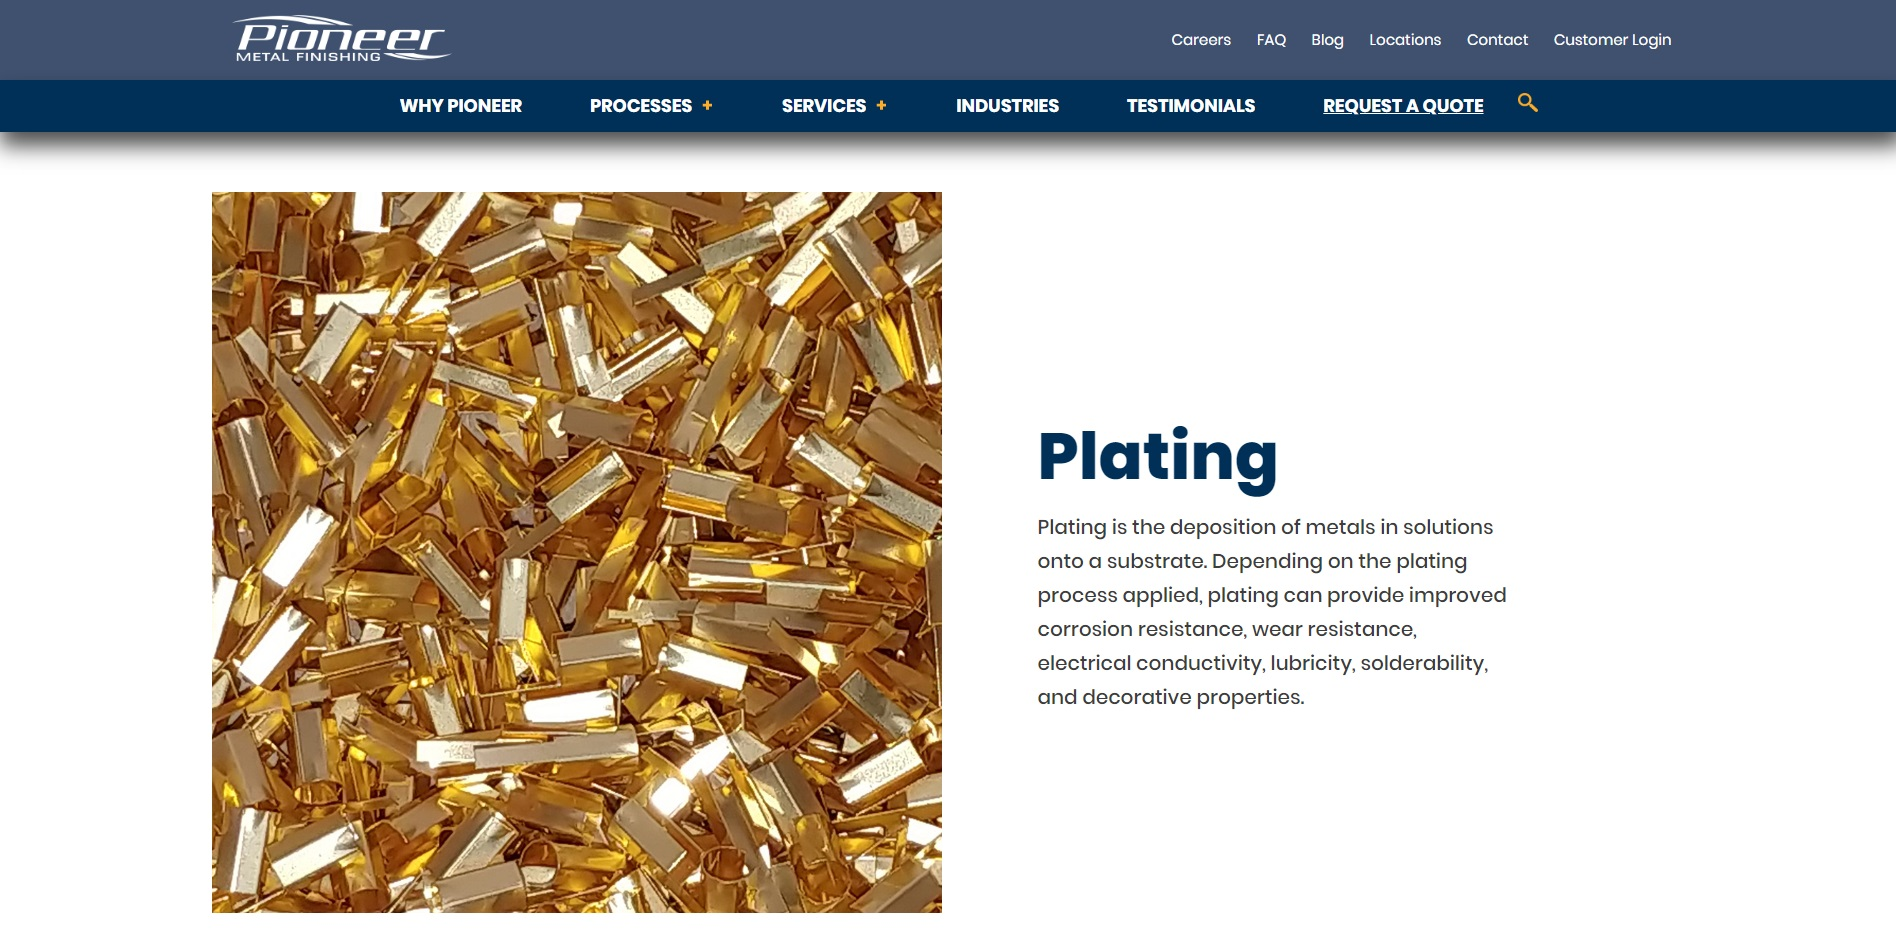 Pioneer Metal Finishing Corporation